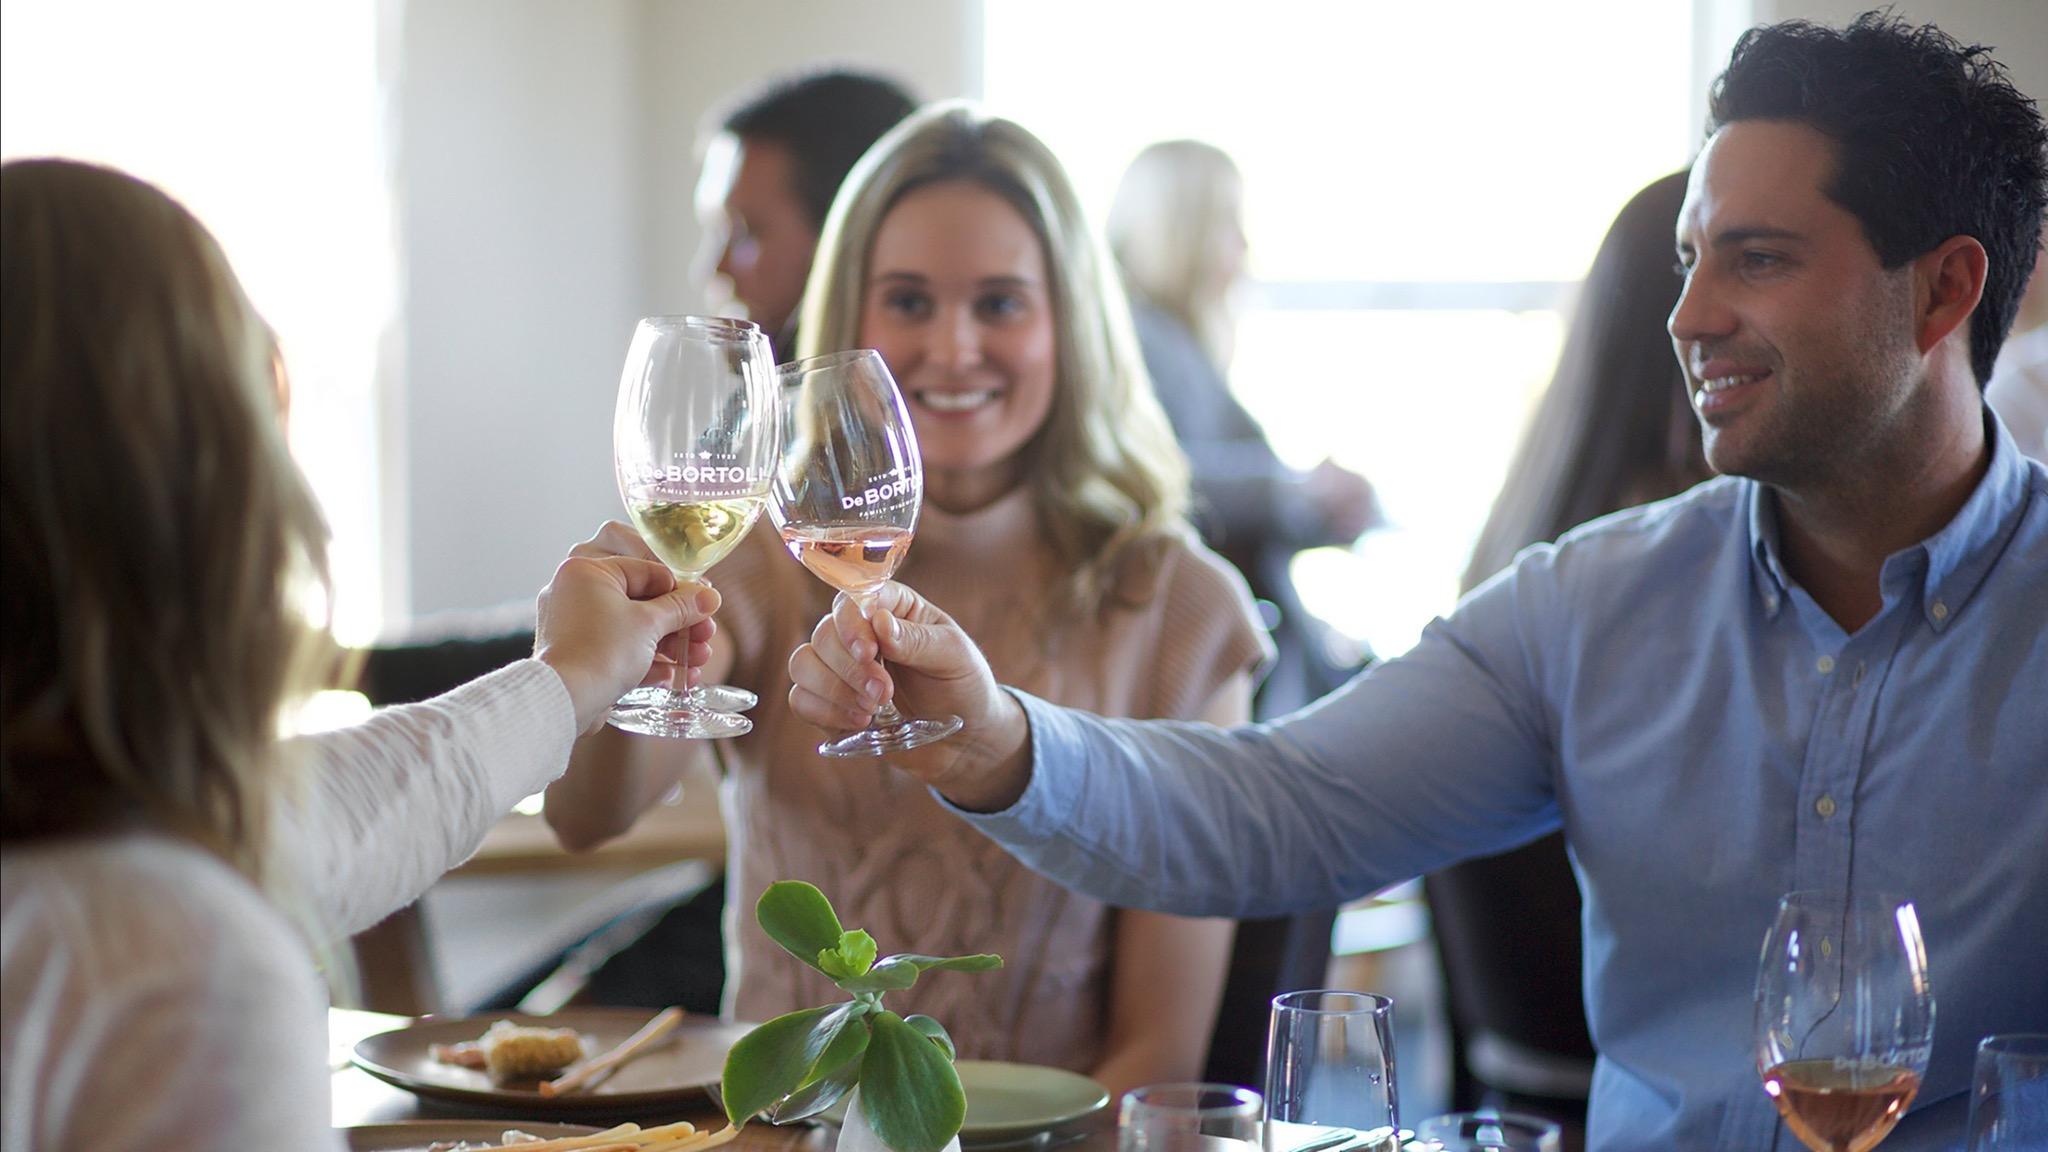 Gumboot Season Lunch - De Bortoli Wines